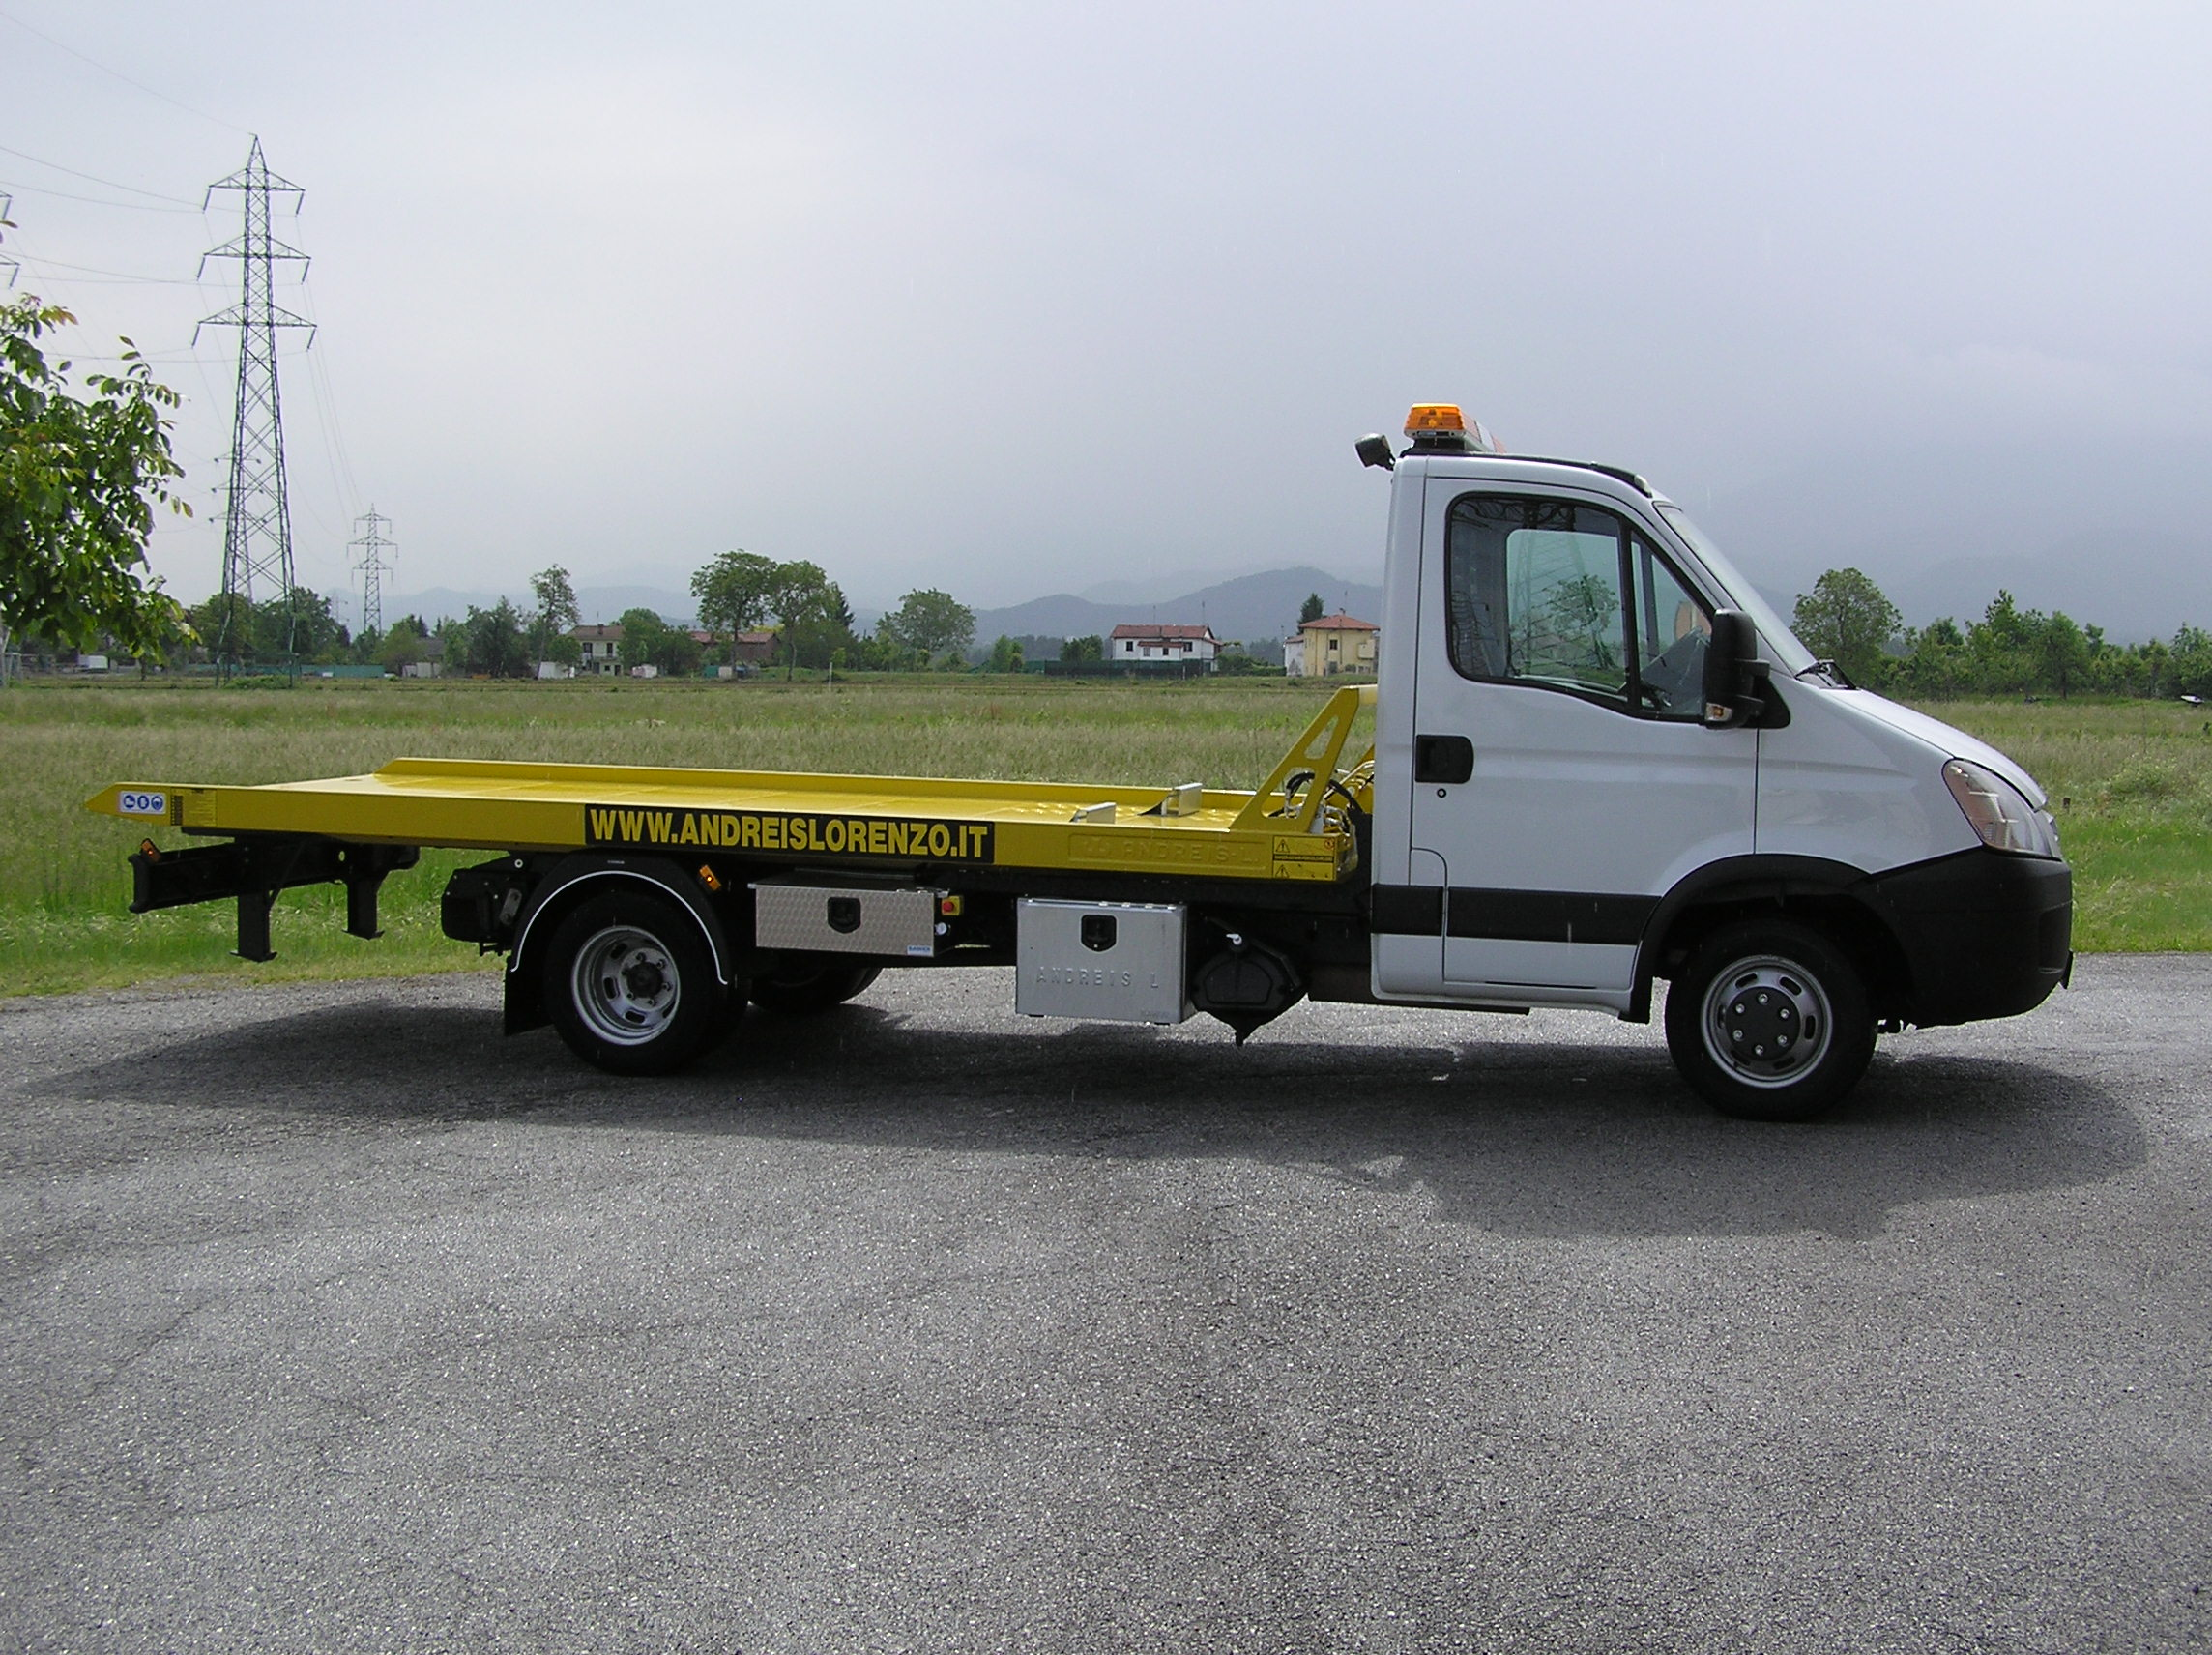 File D 233 Panneuse Carro Attrezzi Towing Truck Abschleppwagen эвакуатор Laweta Daily Jpg